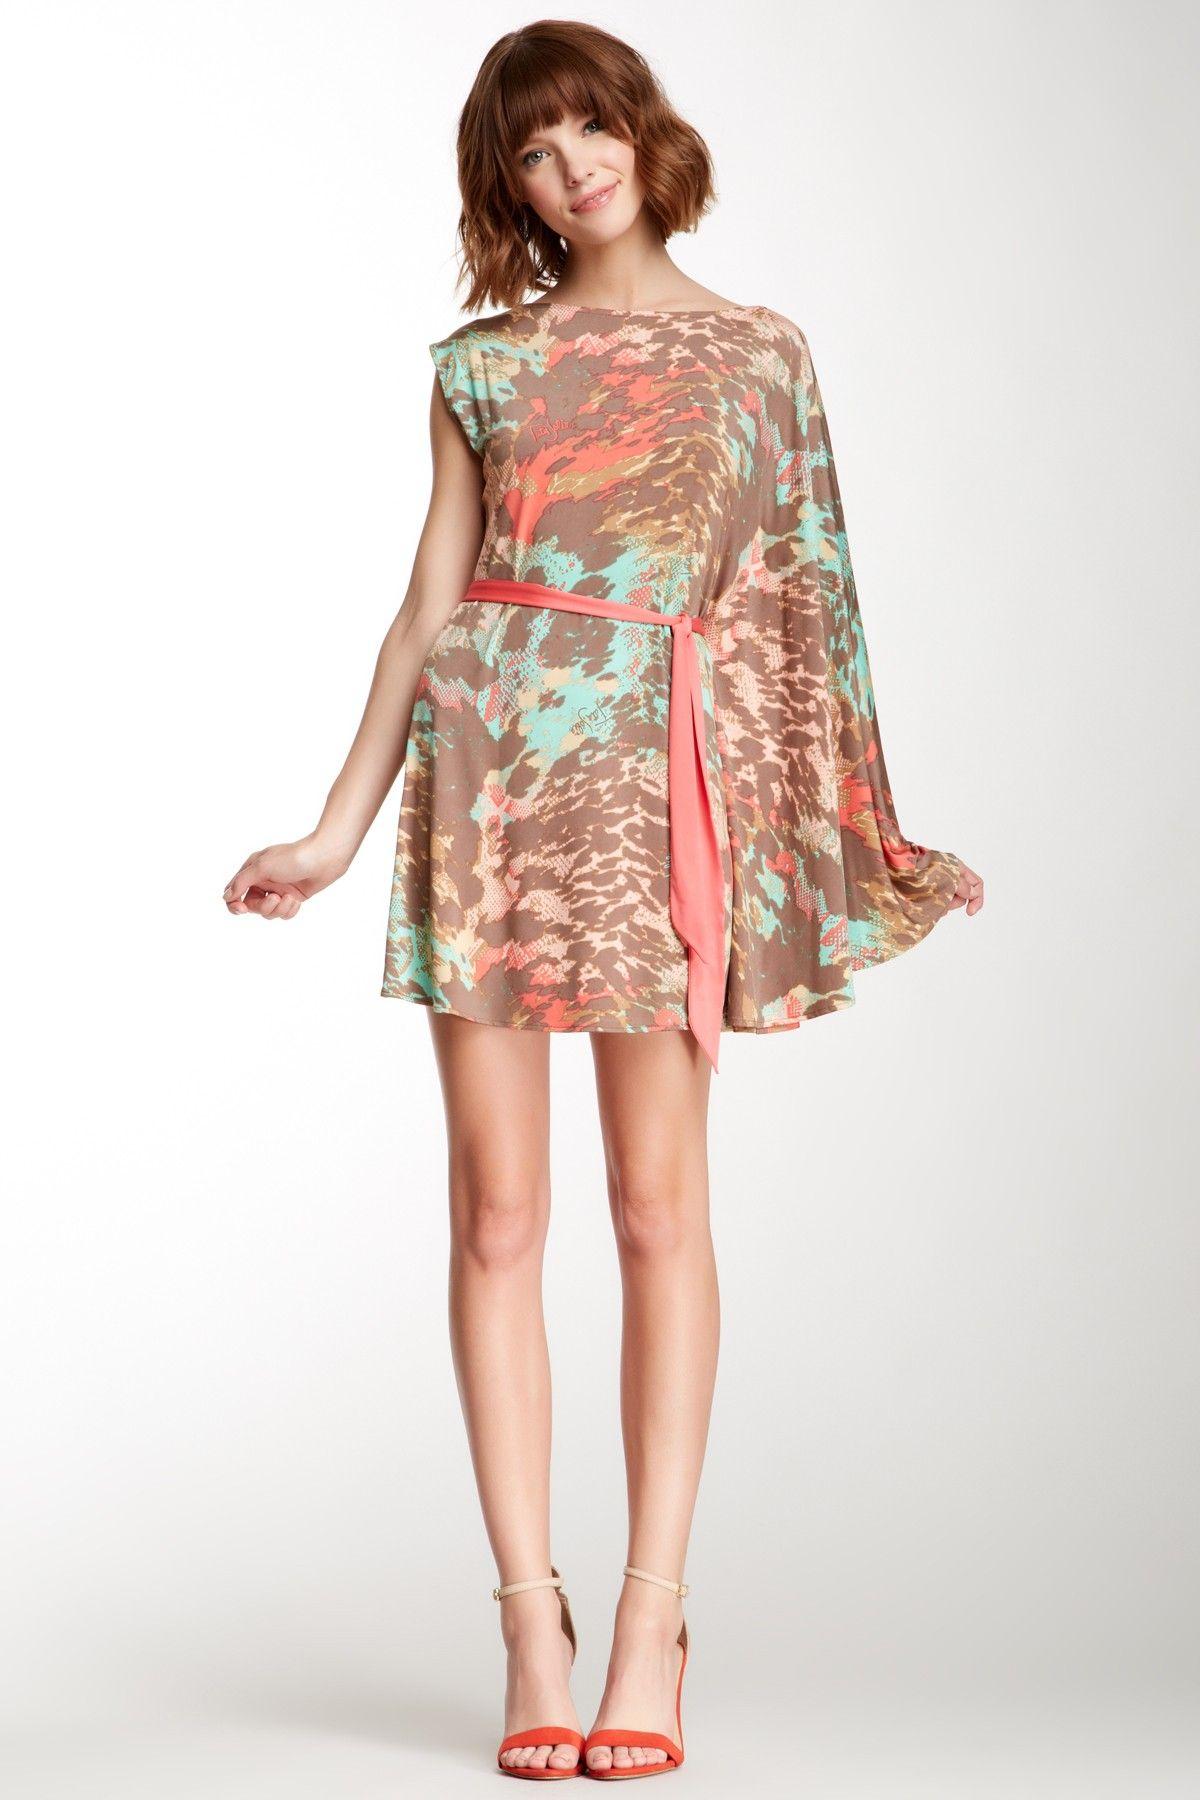 Tata jolie paola one big sleeve dress dresses pinterest